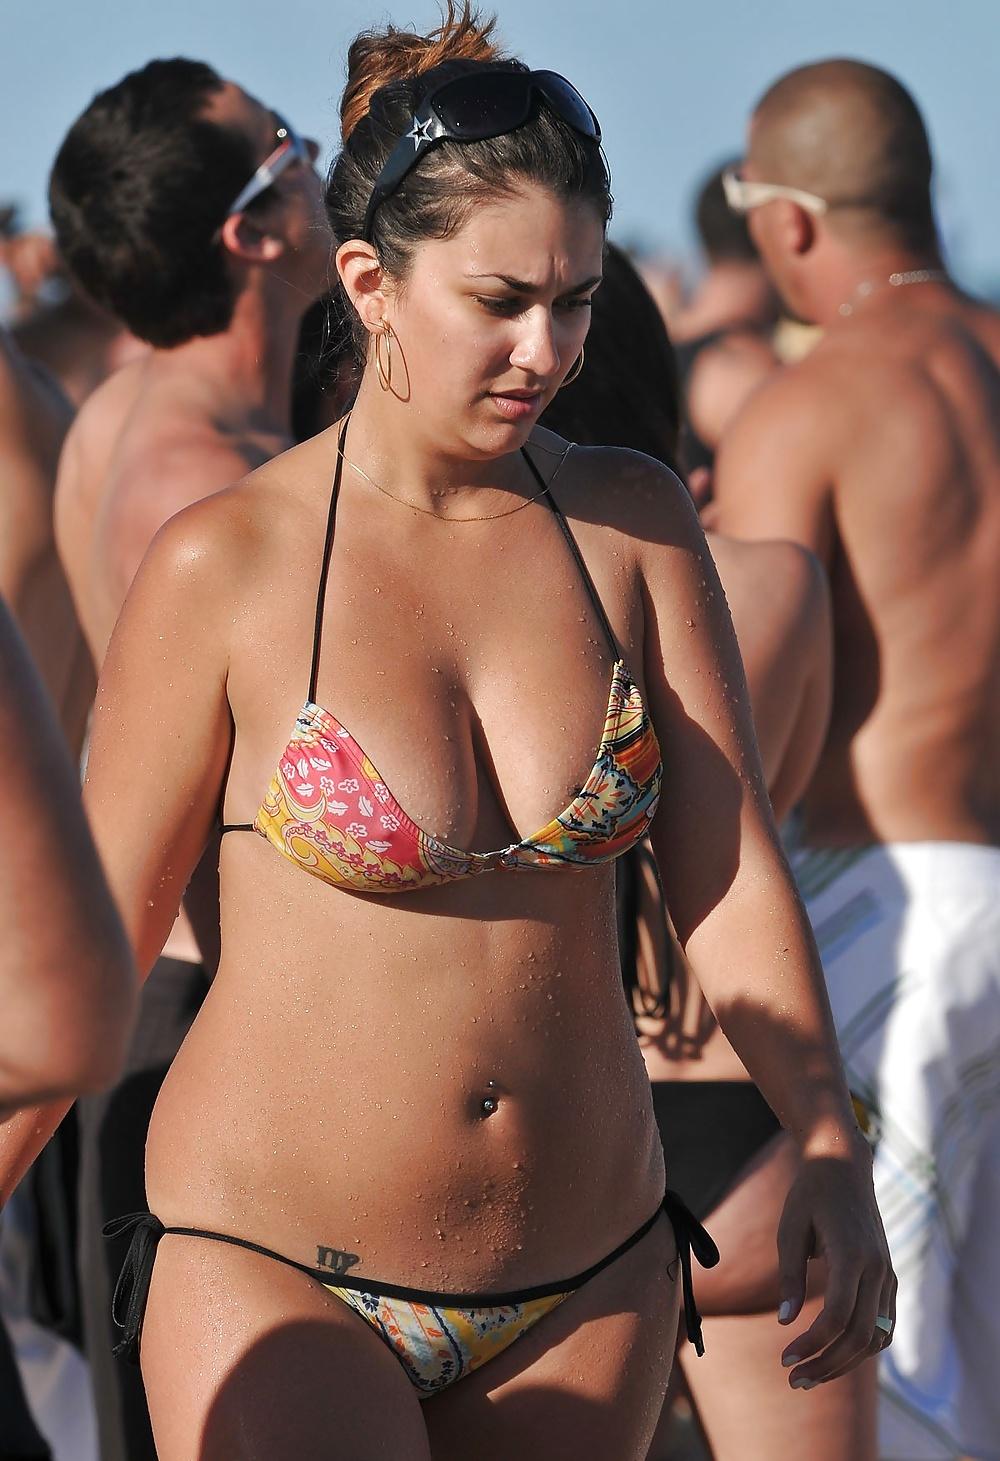 Search tit bikini 15